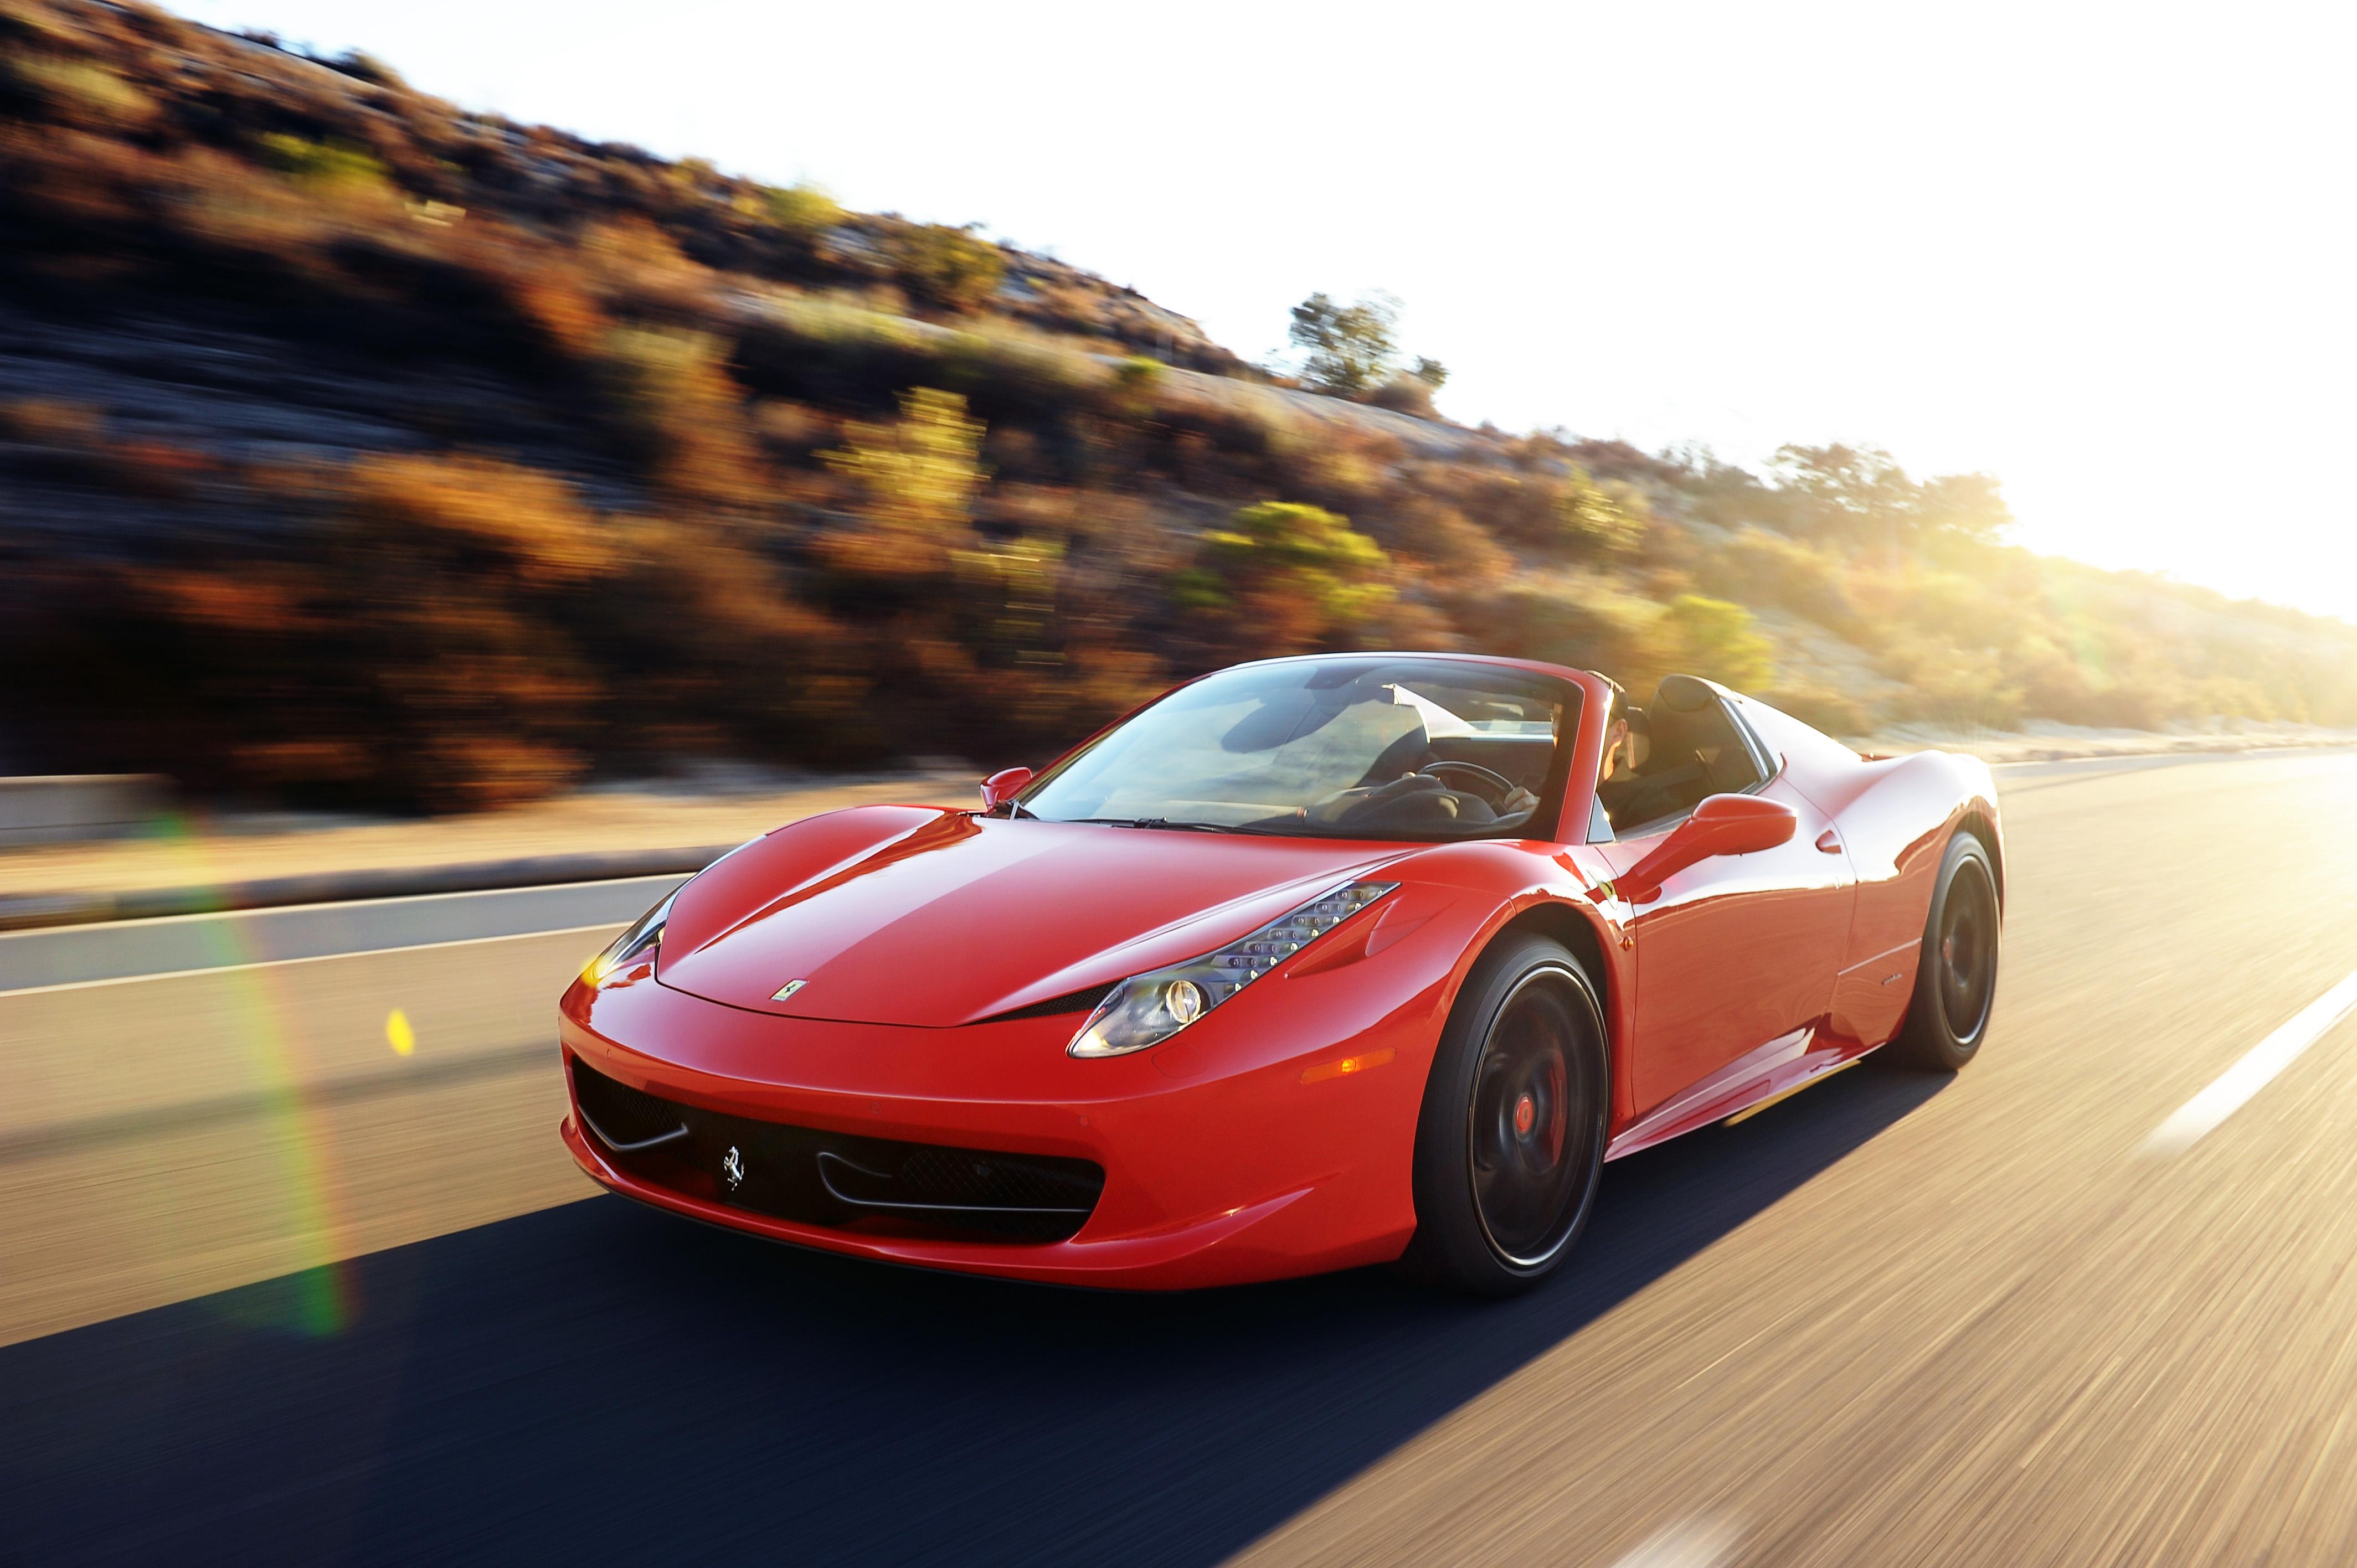 Italian Sports Car Informally